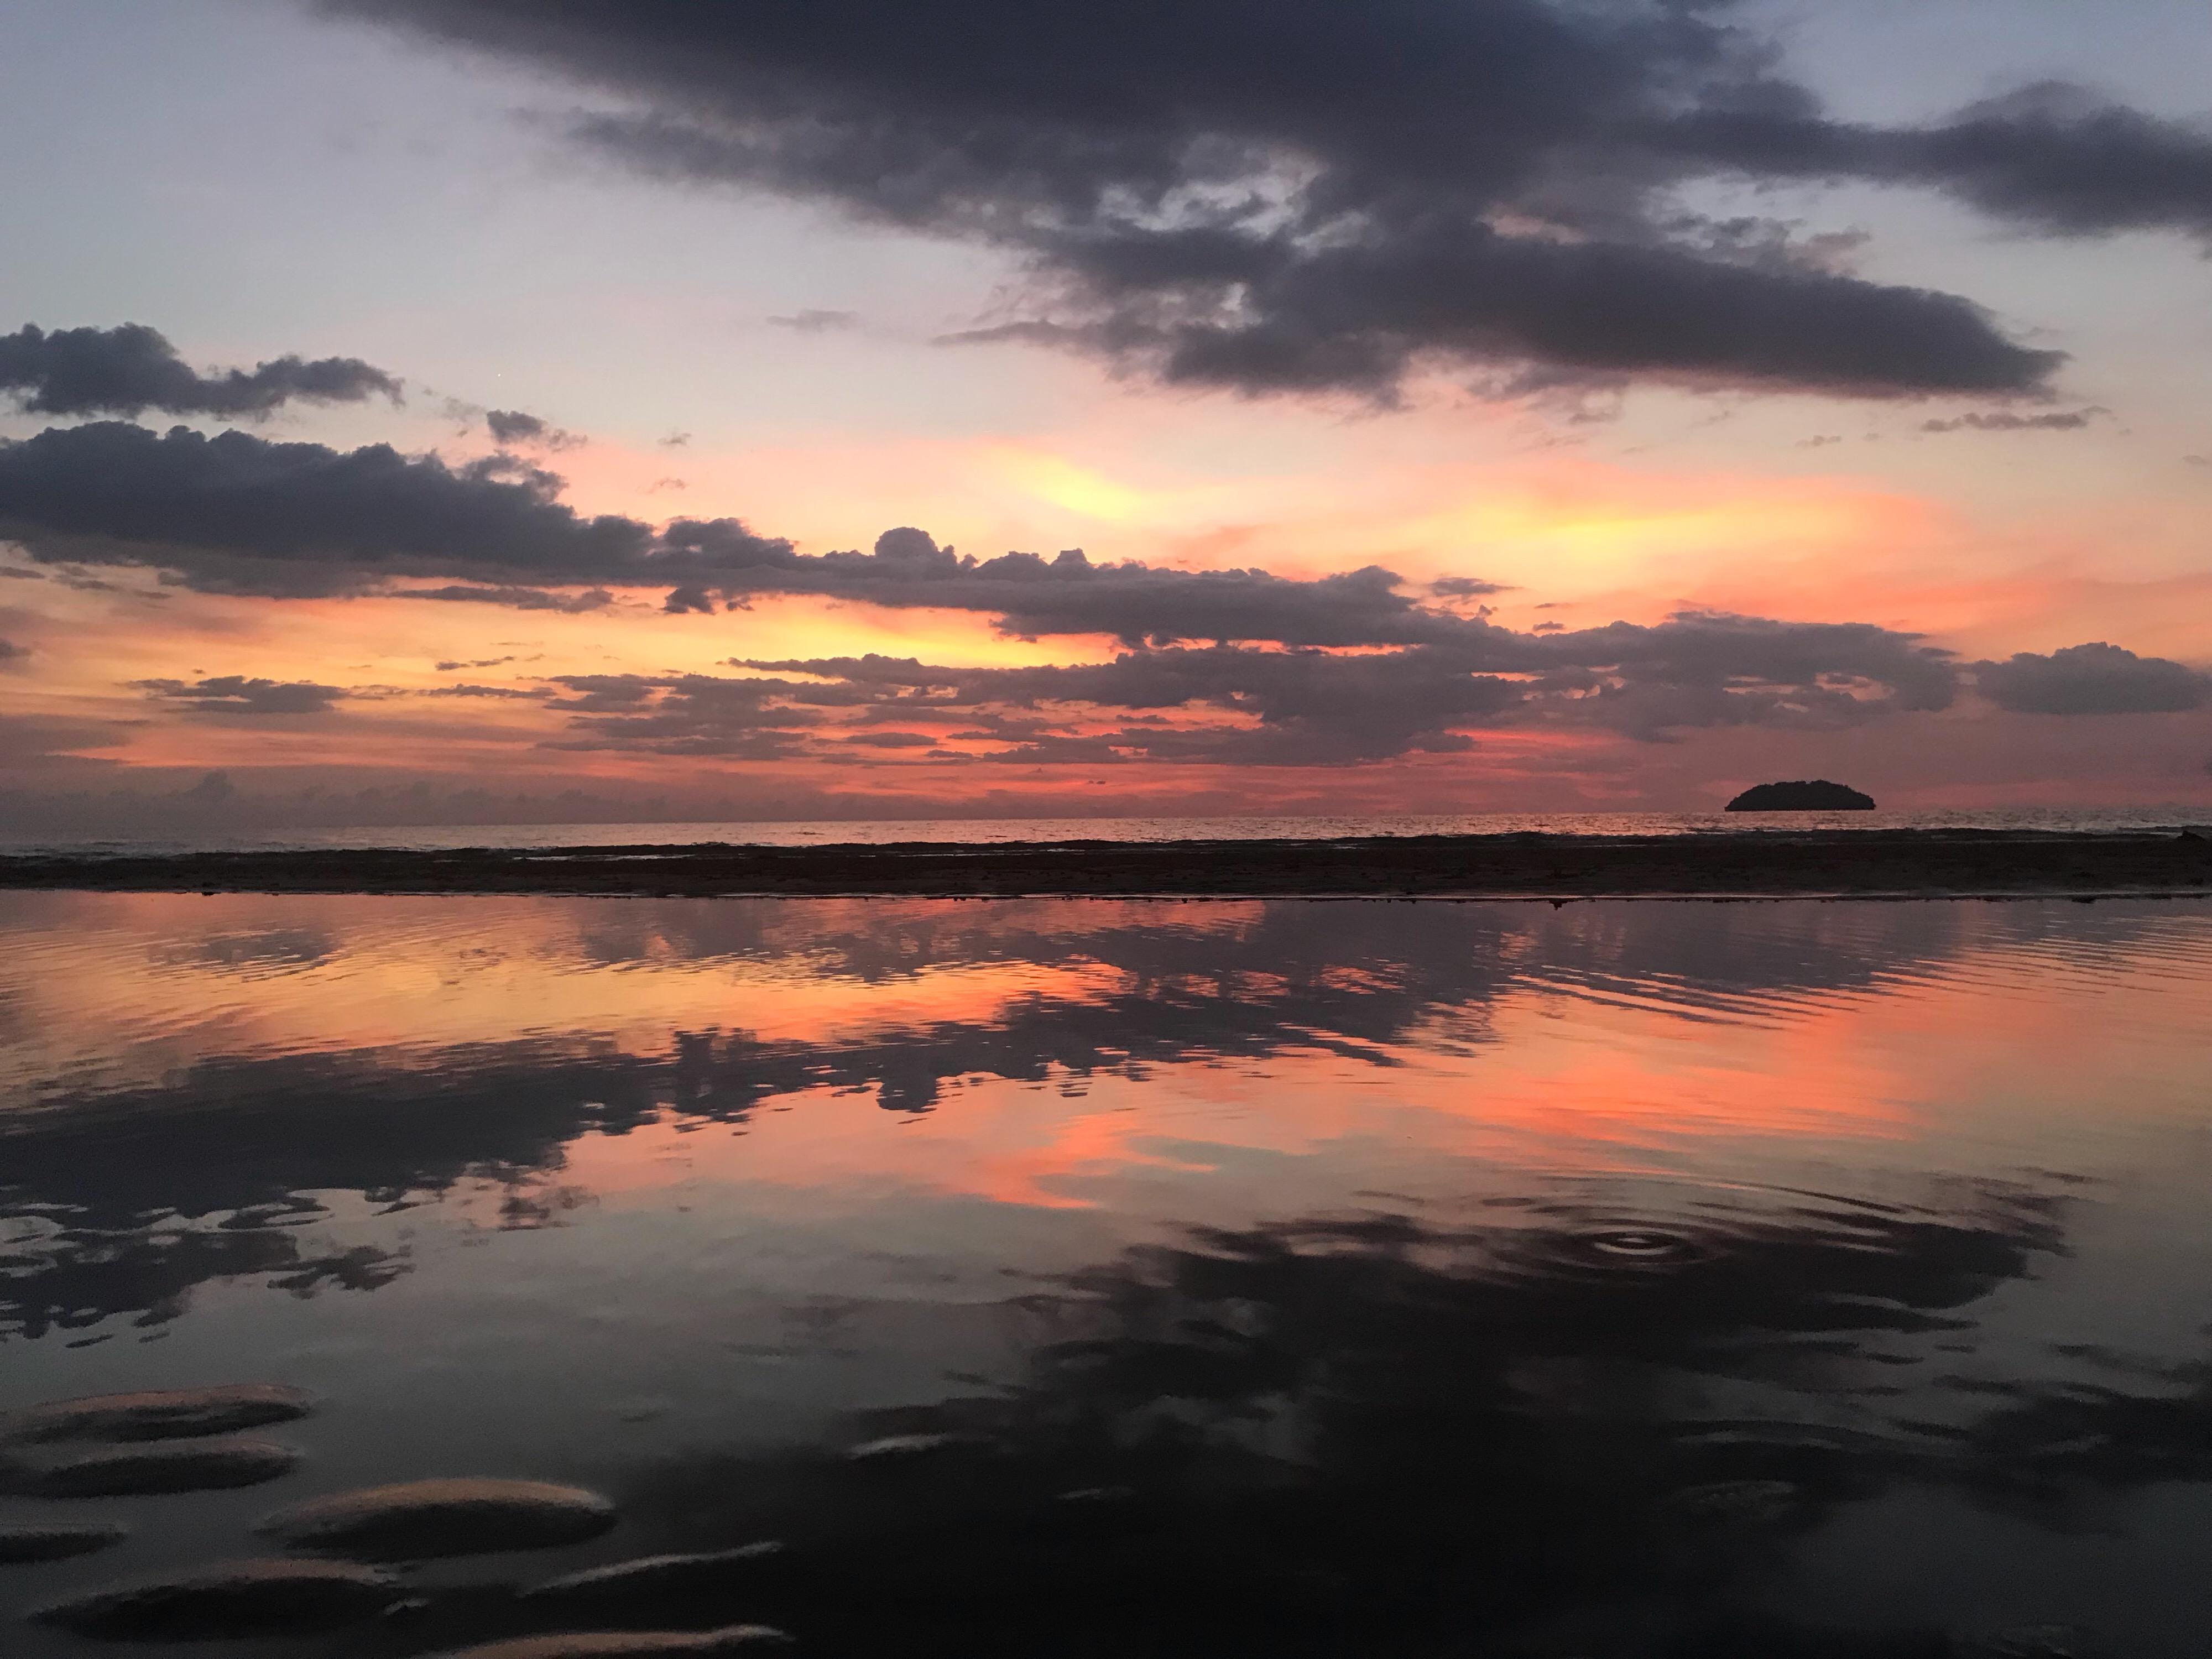 #sunset #twillight #reflectionsofwater #nature #photography #freetoedit